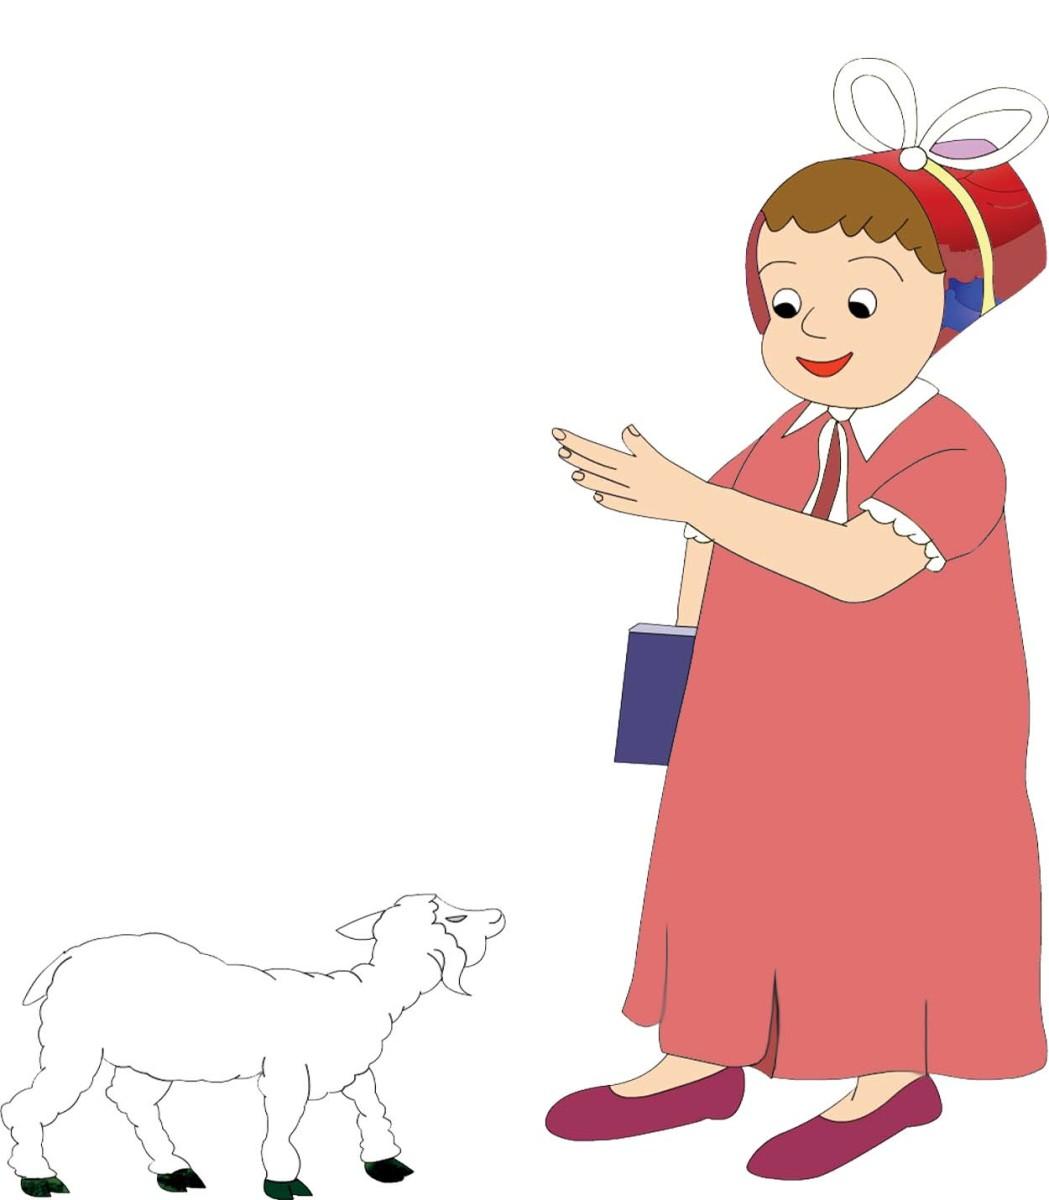 Nursery Rhymes - Mary Had a Little Lamb